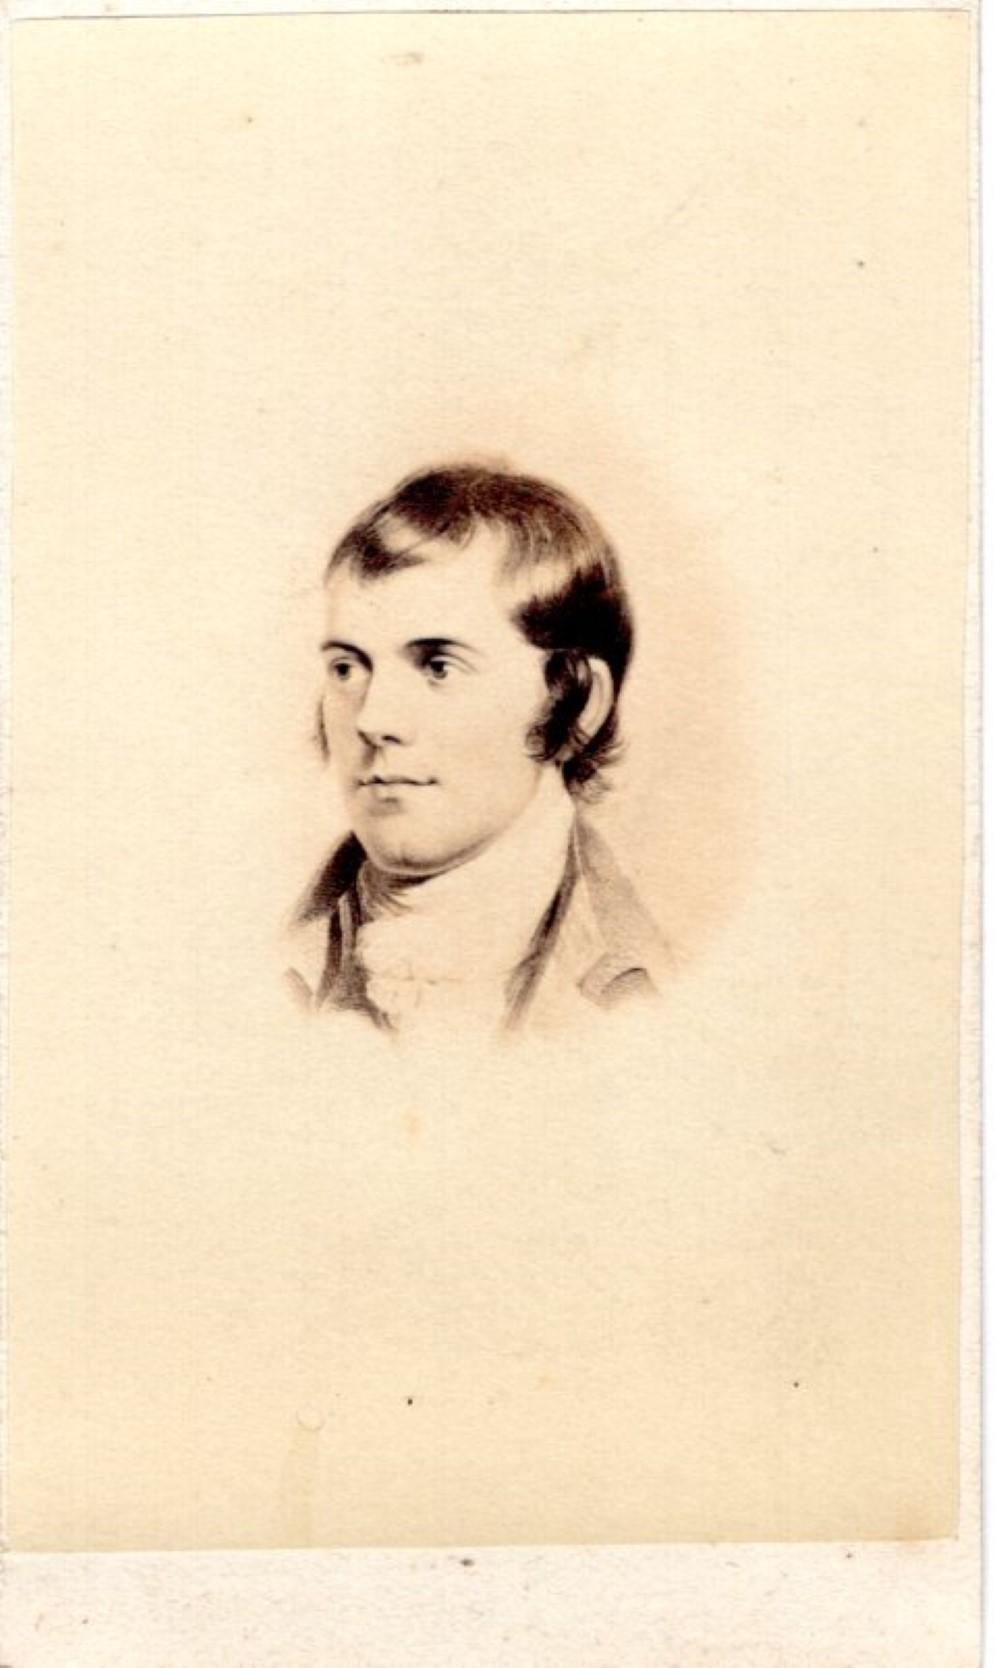 Robert Burns CDV